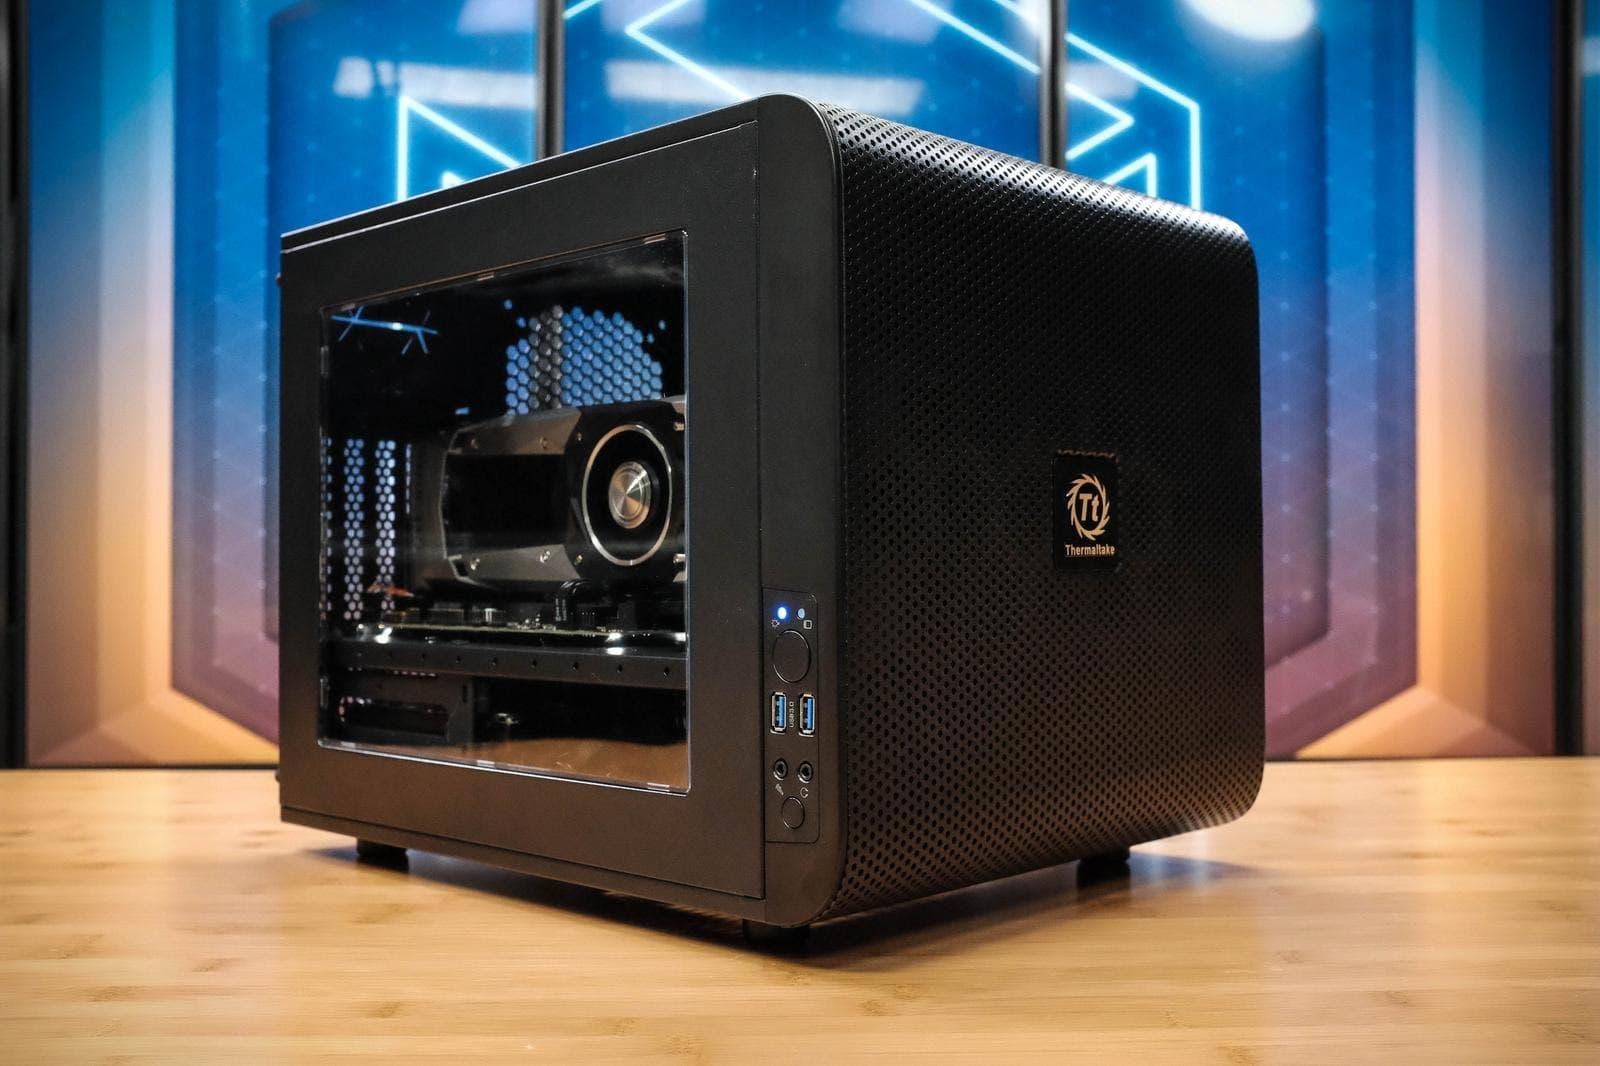 thermaltake core v21 cube pc case build